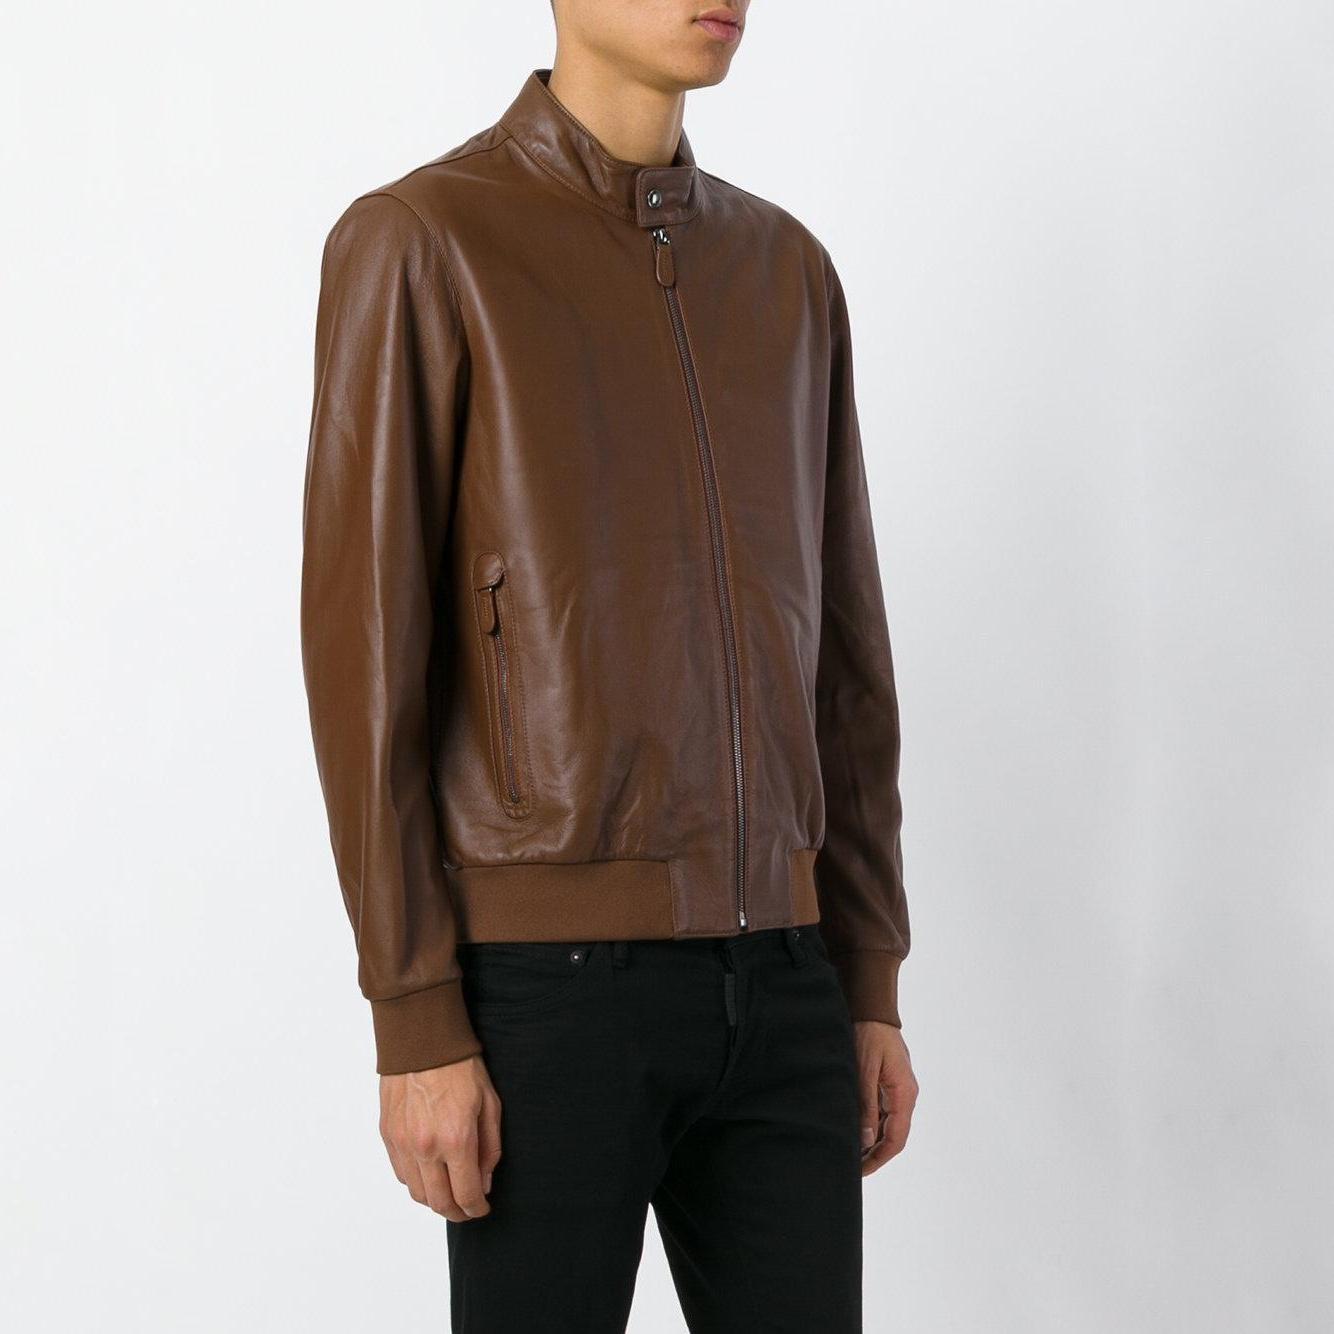 z-zegna-Brown-Bomber-style-Jacket (2).jpg